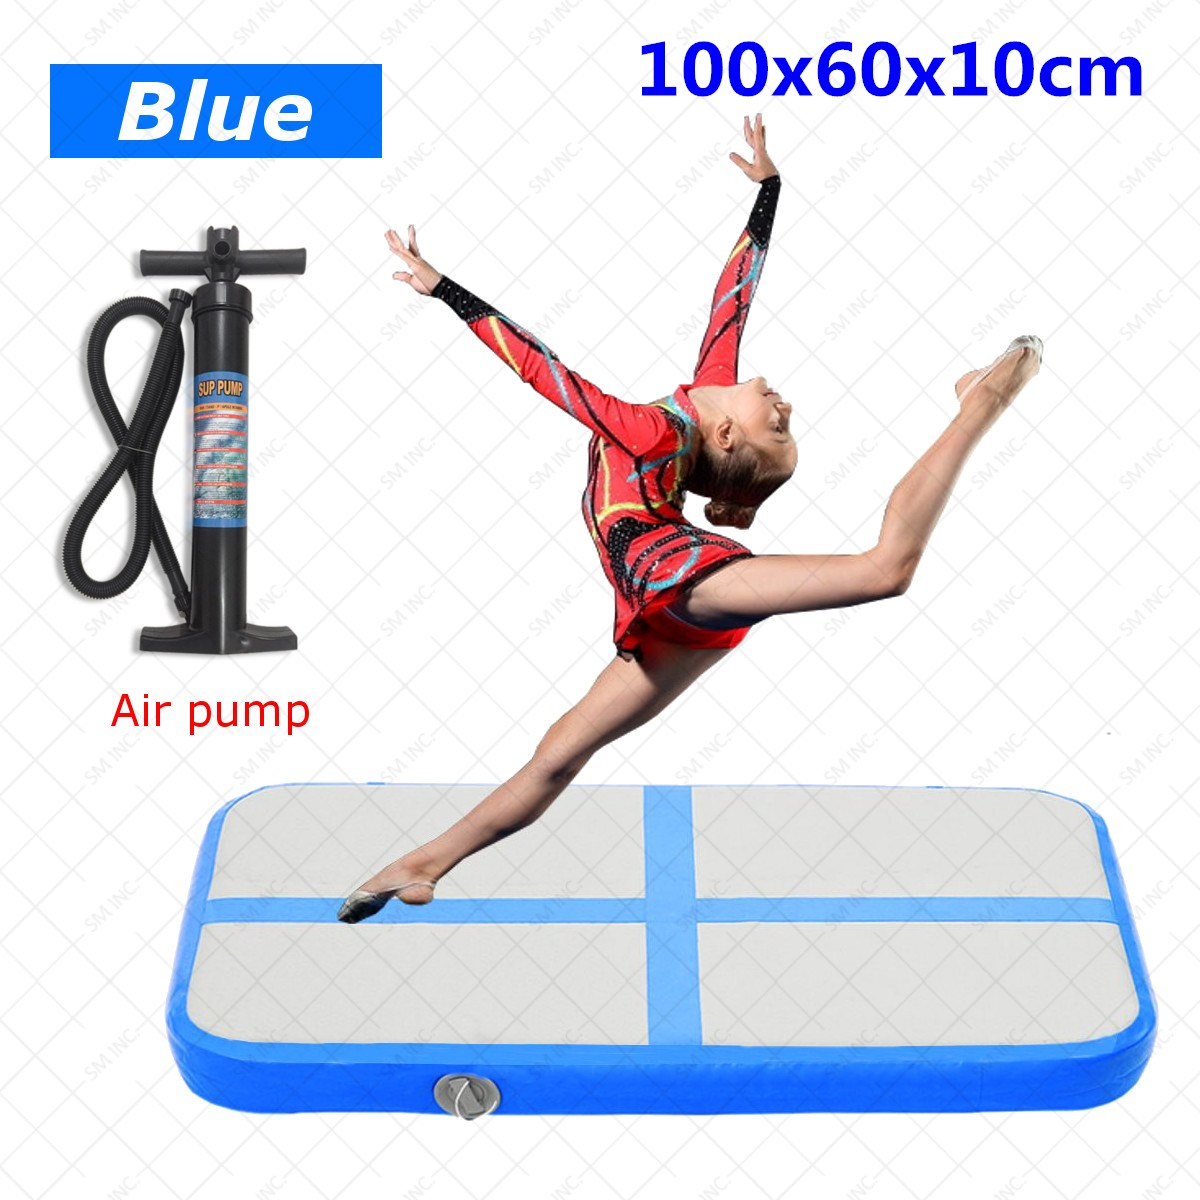 New Blue Inflatable Air Track Mat Cheerleading Gymnastics Floor Tumbling + Hand Pump free shipping 8x2m factory supply inflatable tumbling air track factory gymnastic gym mat